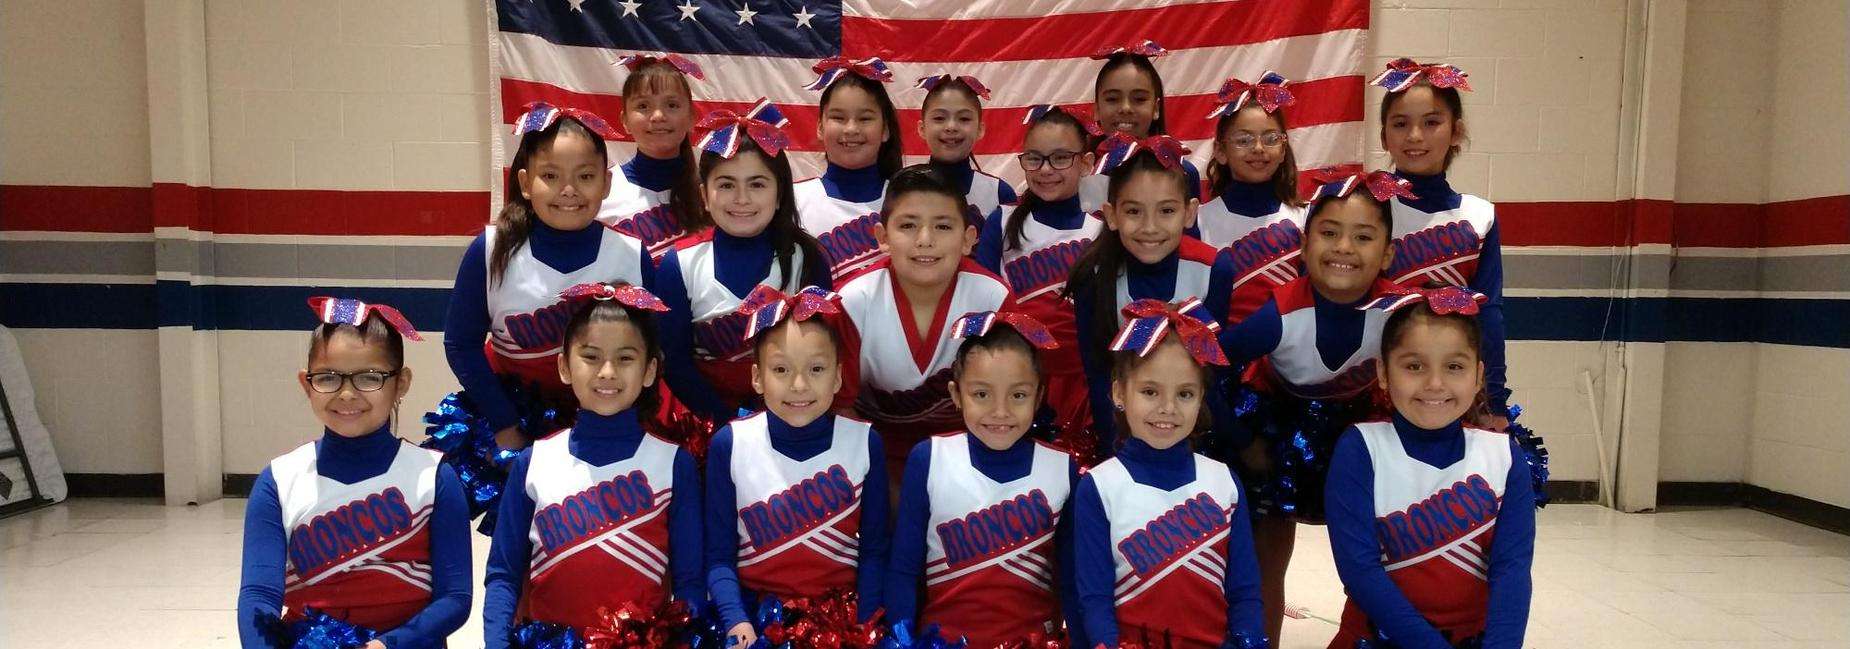 Roosevelt Cheer Squad